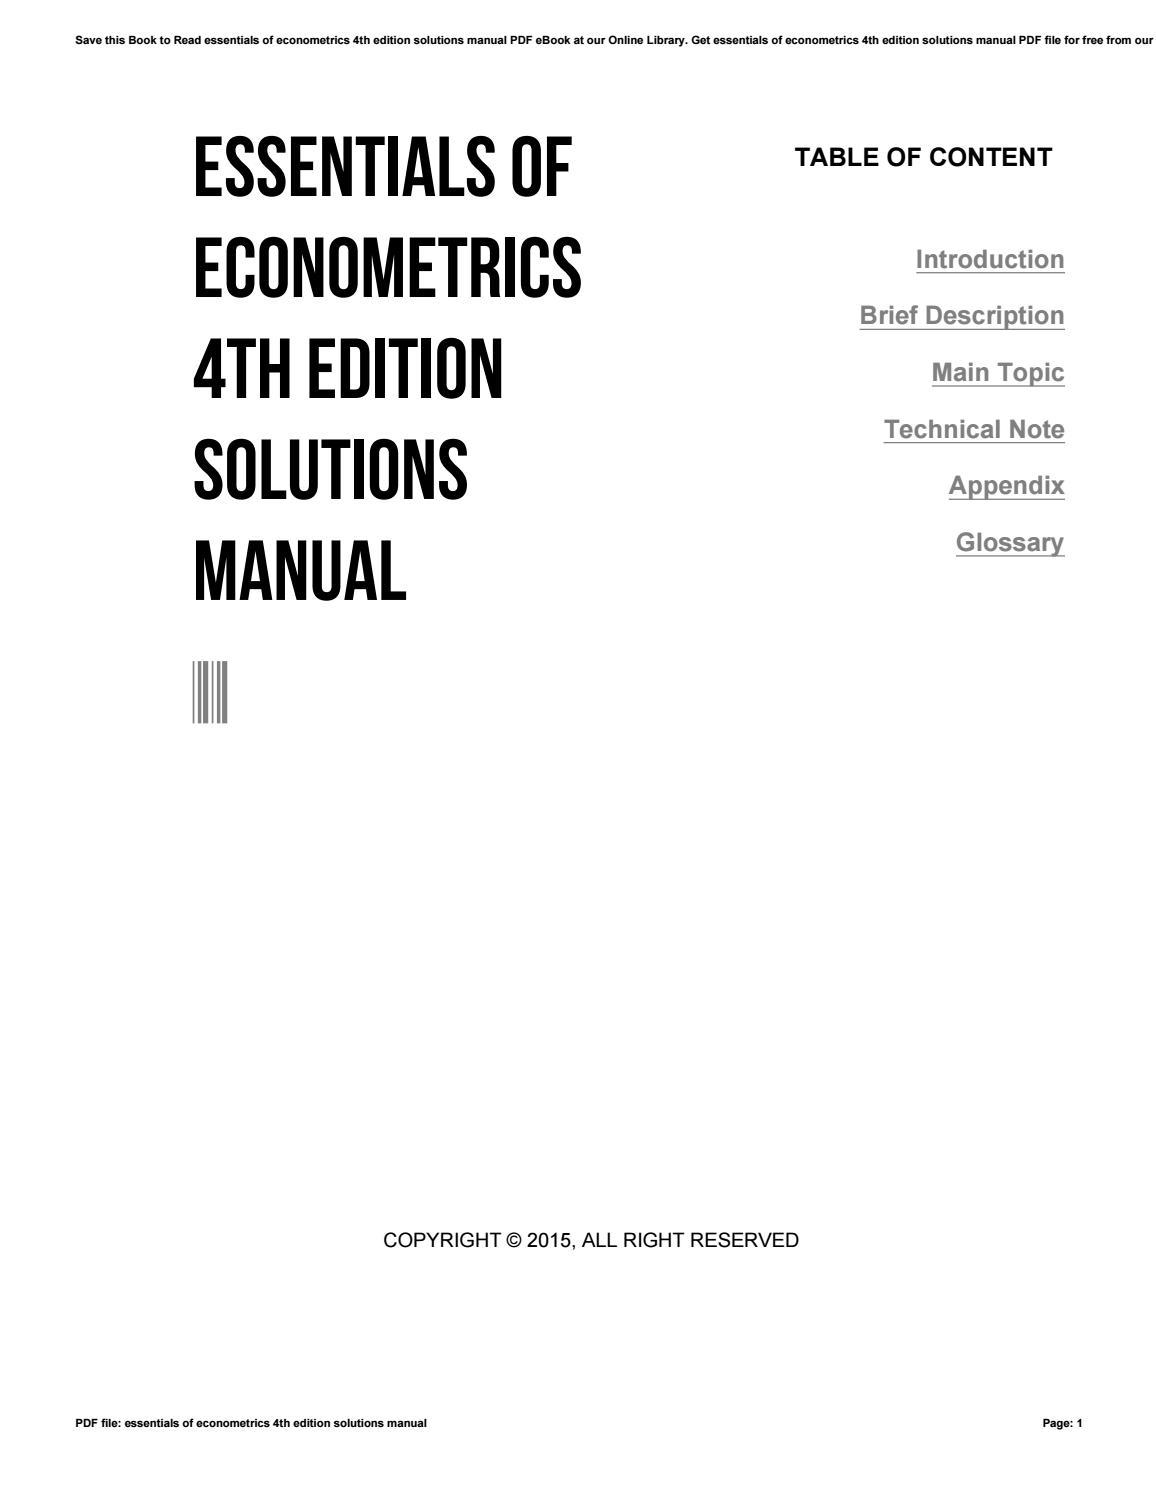 Essentials Of Econometrics 4th Edition Solutions Manual By E Mailbox6 Issuu